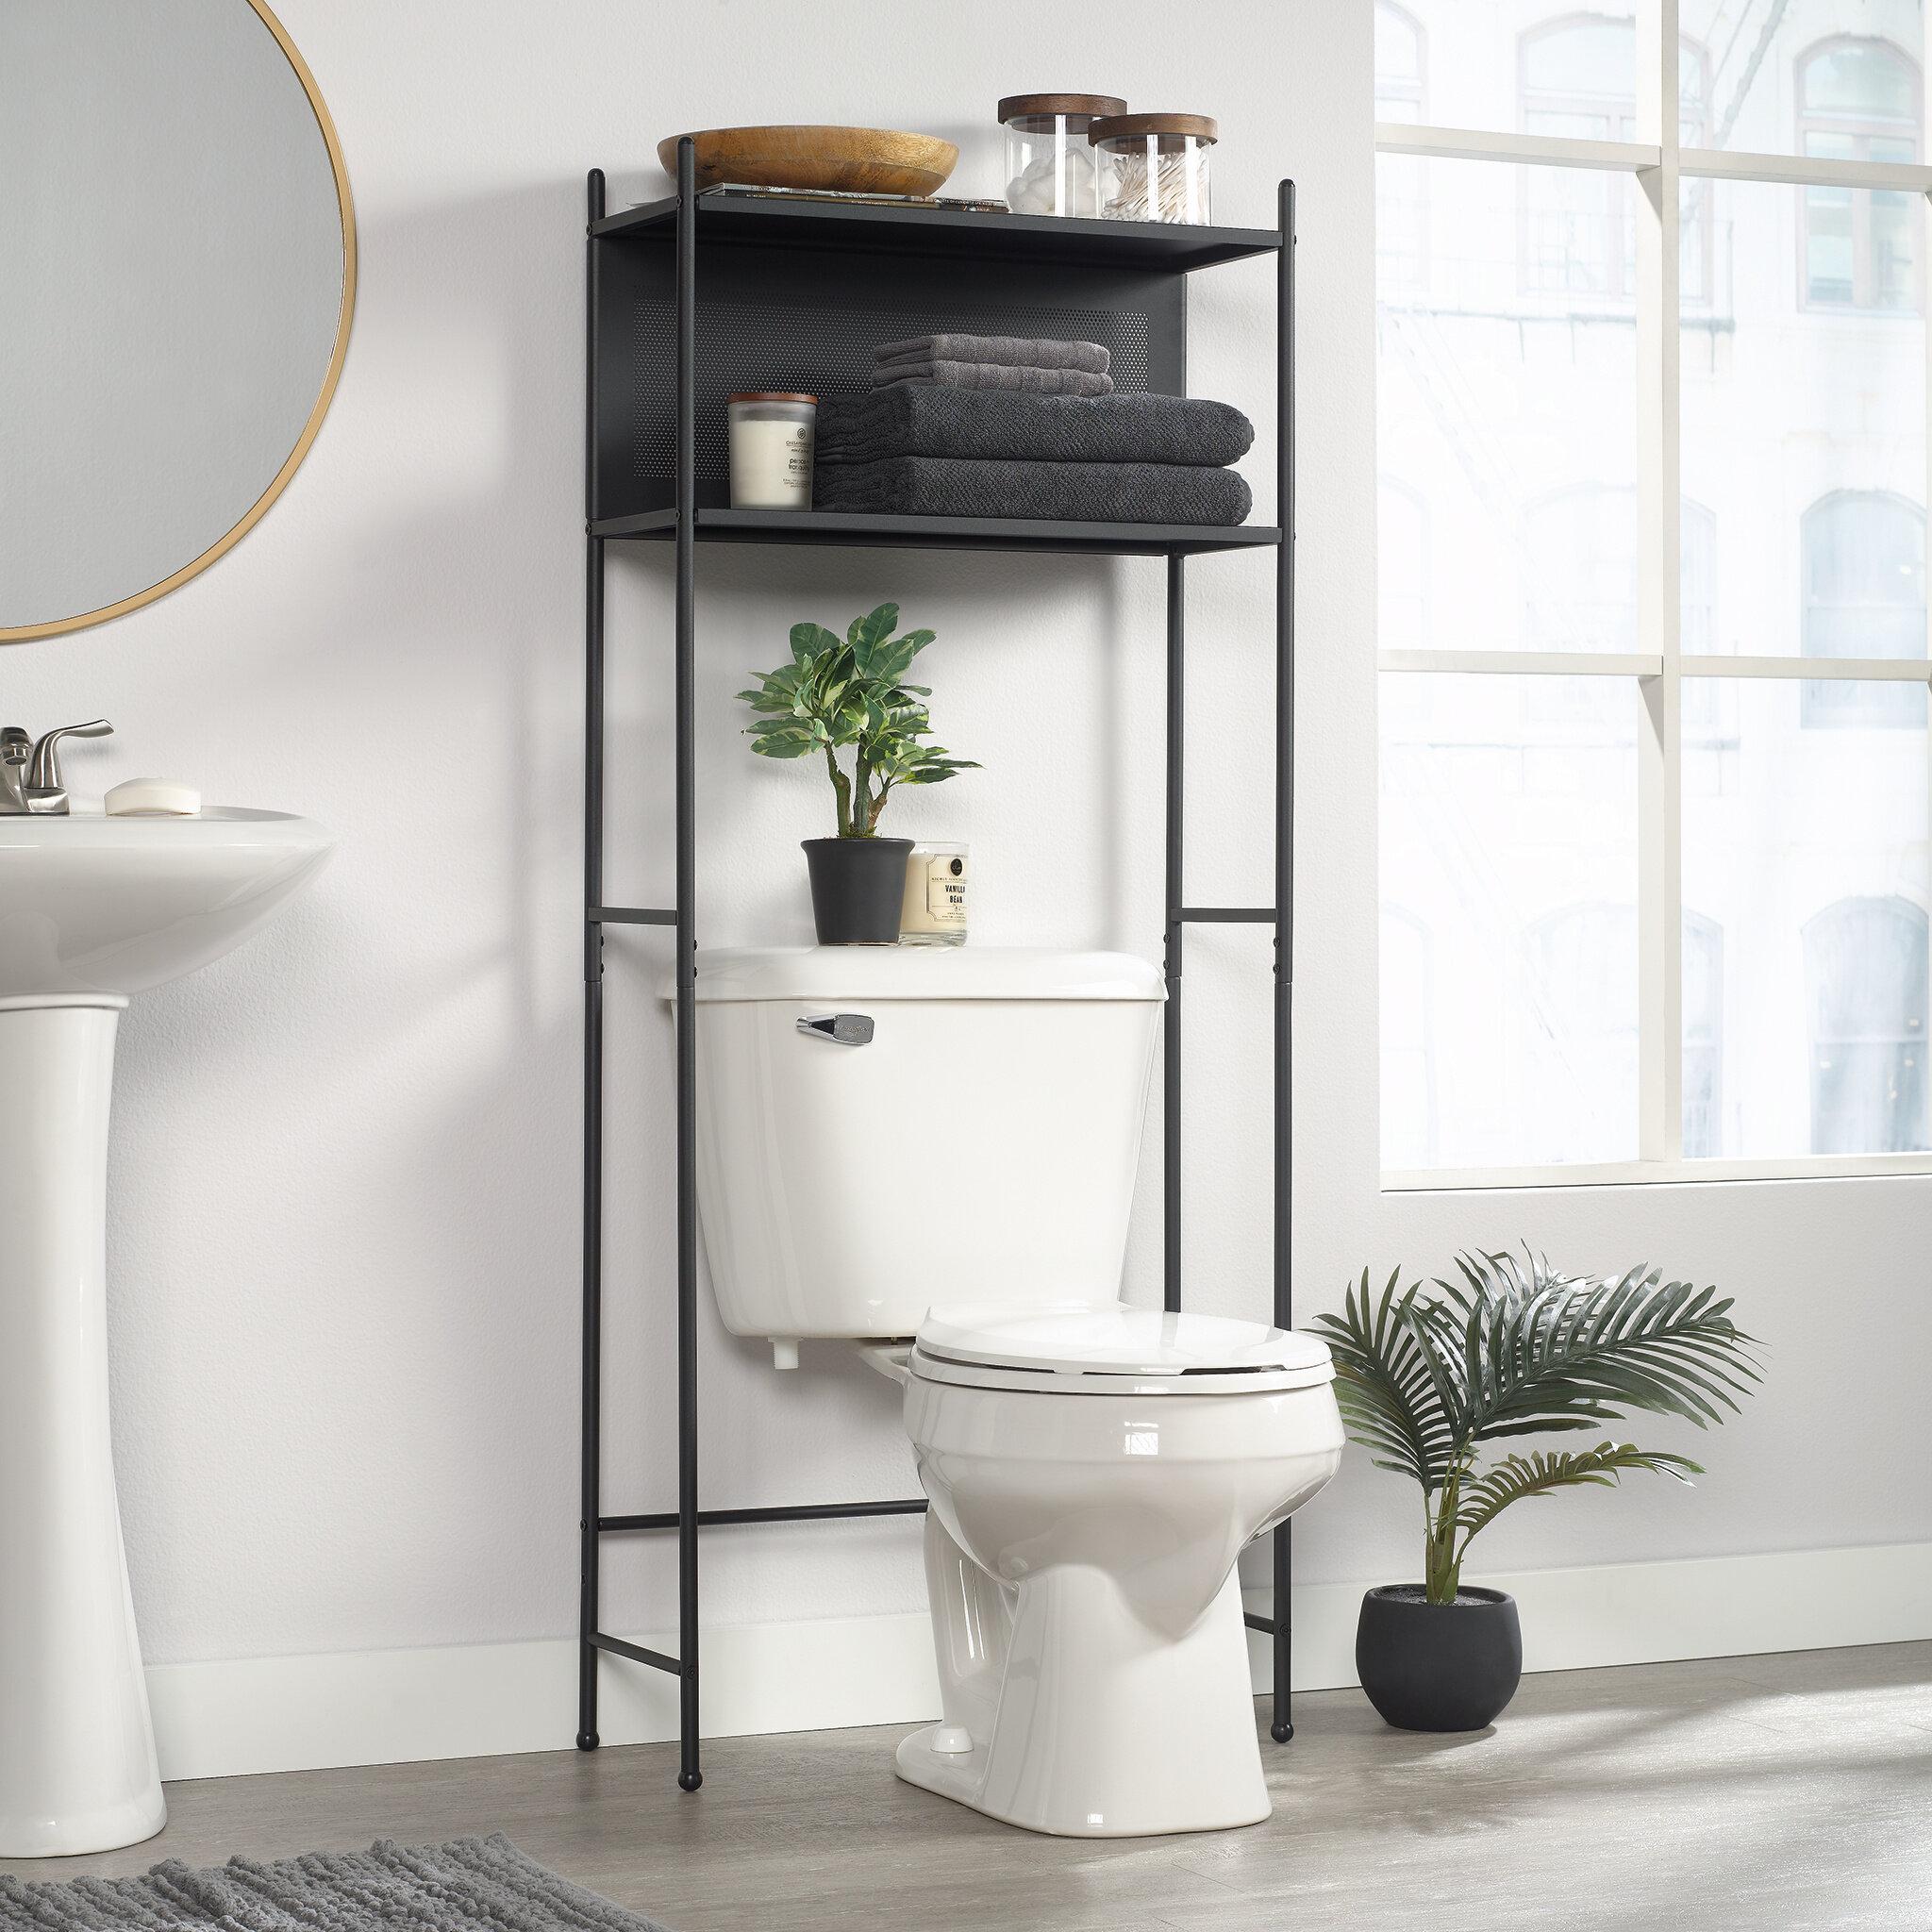 Metal 17 Stories Bathroom Cabinets Shelving You Ll Love In 2021 Wayfair